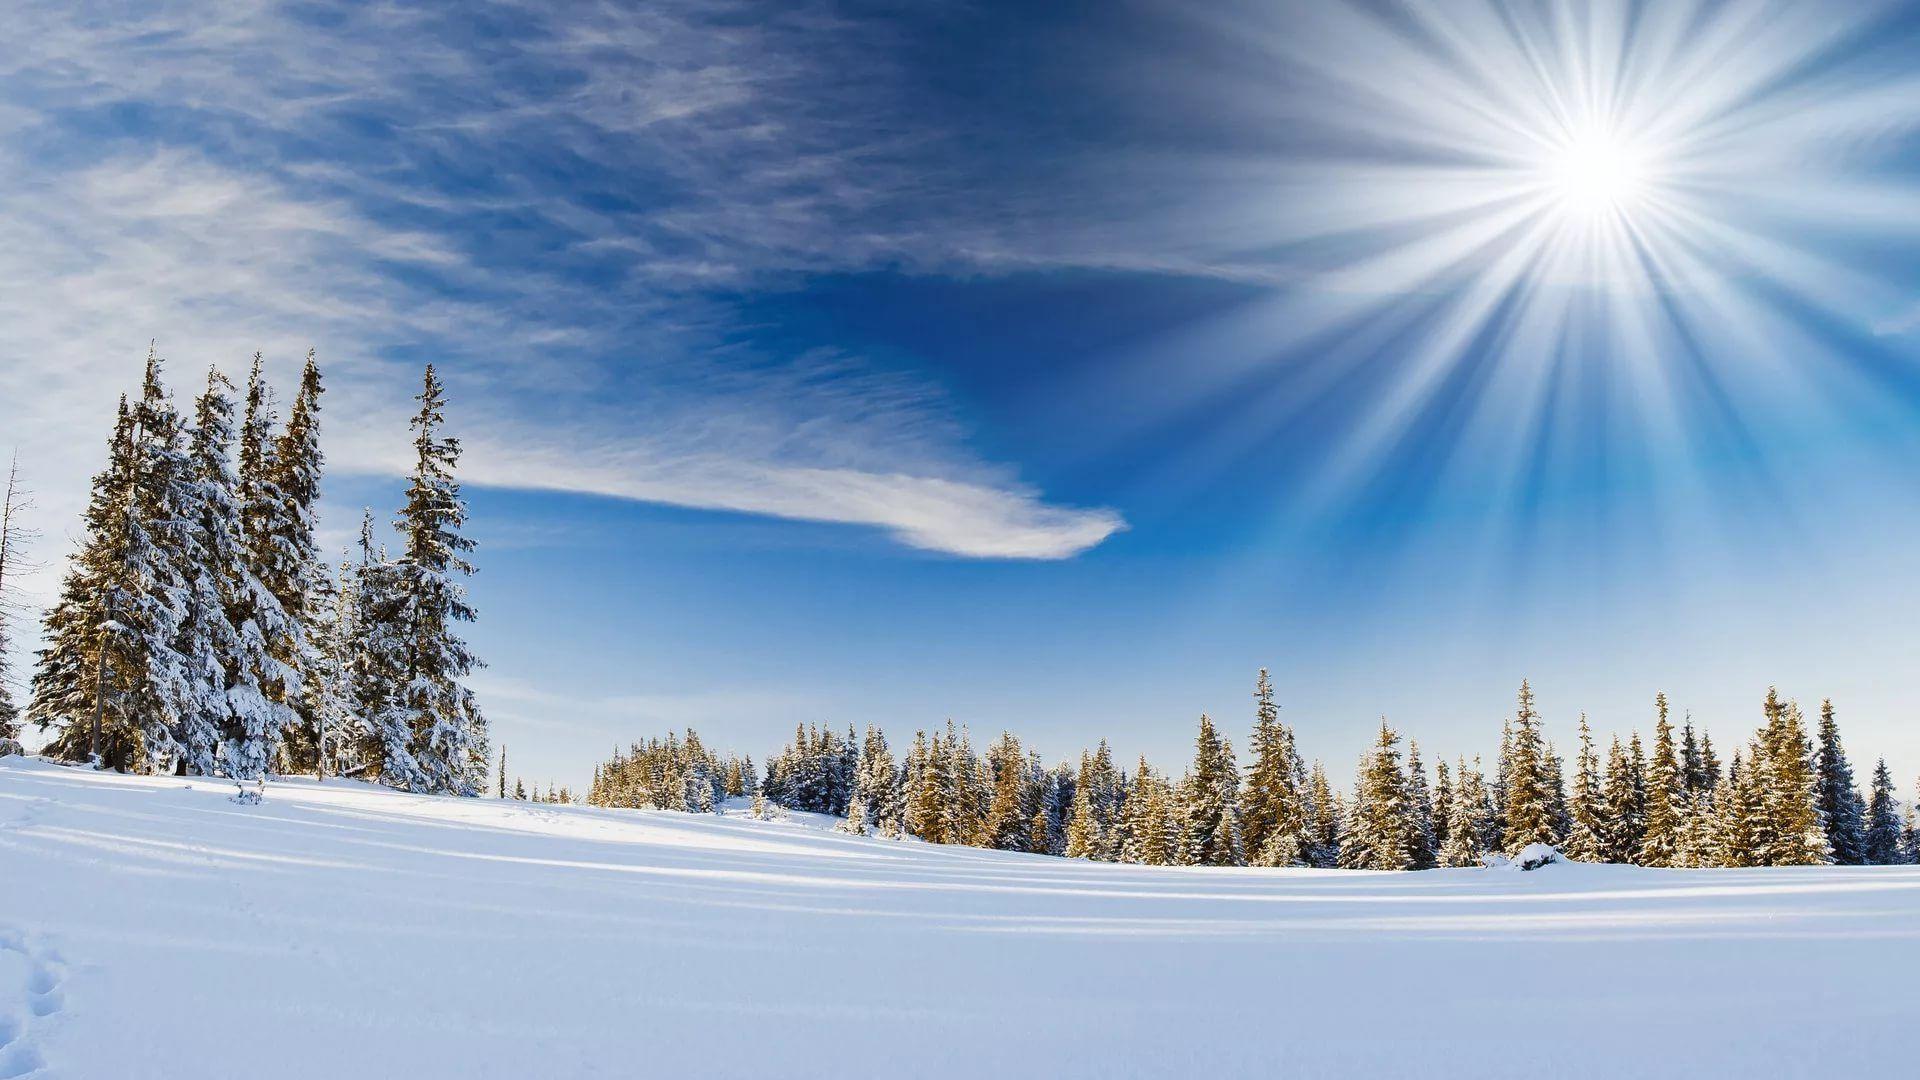 Happy Winter High Definition